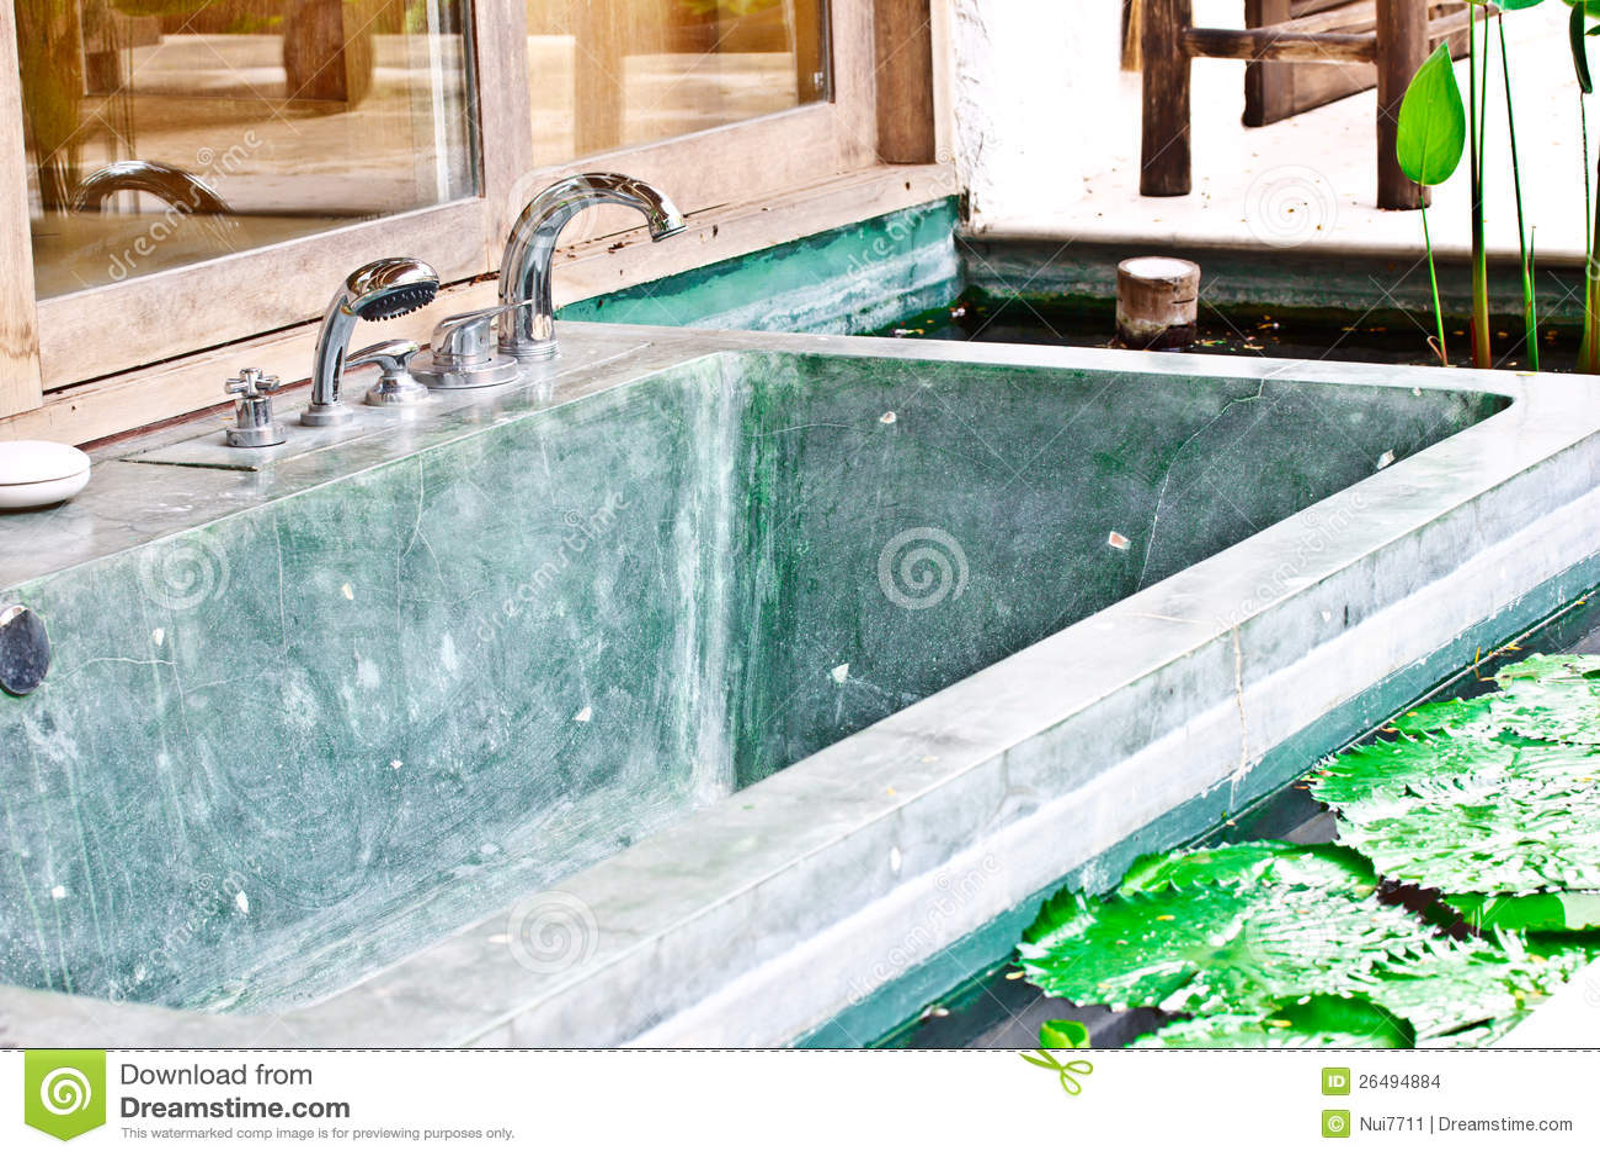 Vasca Da Bagno Usata Prezzi : Vasca da bagno esterna della jacuzzi in giardino fotografia